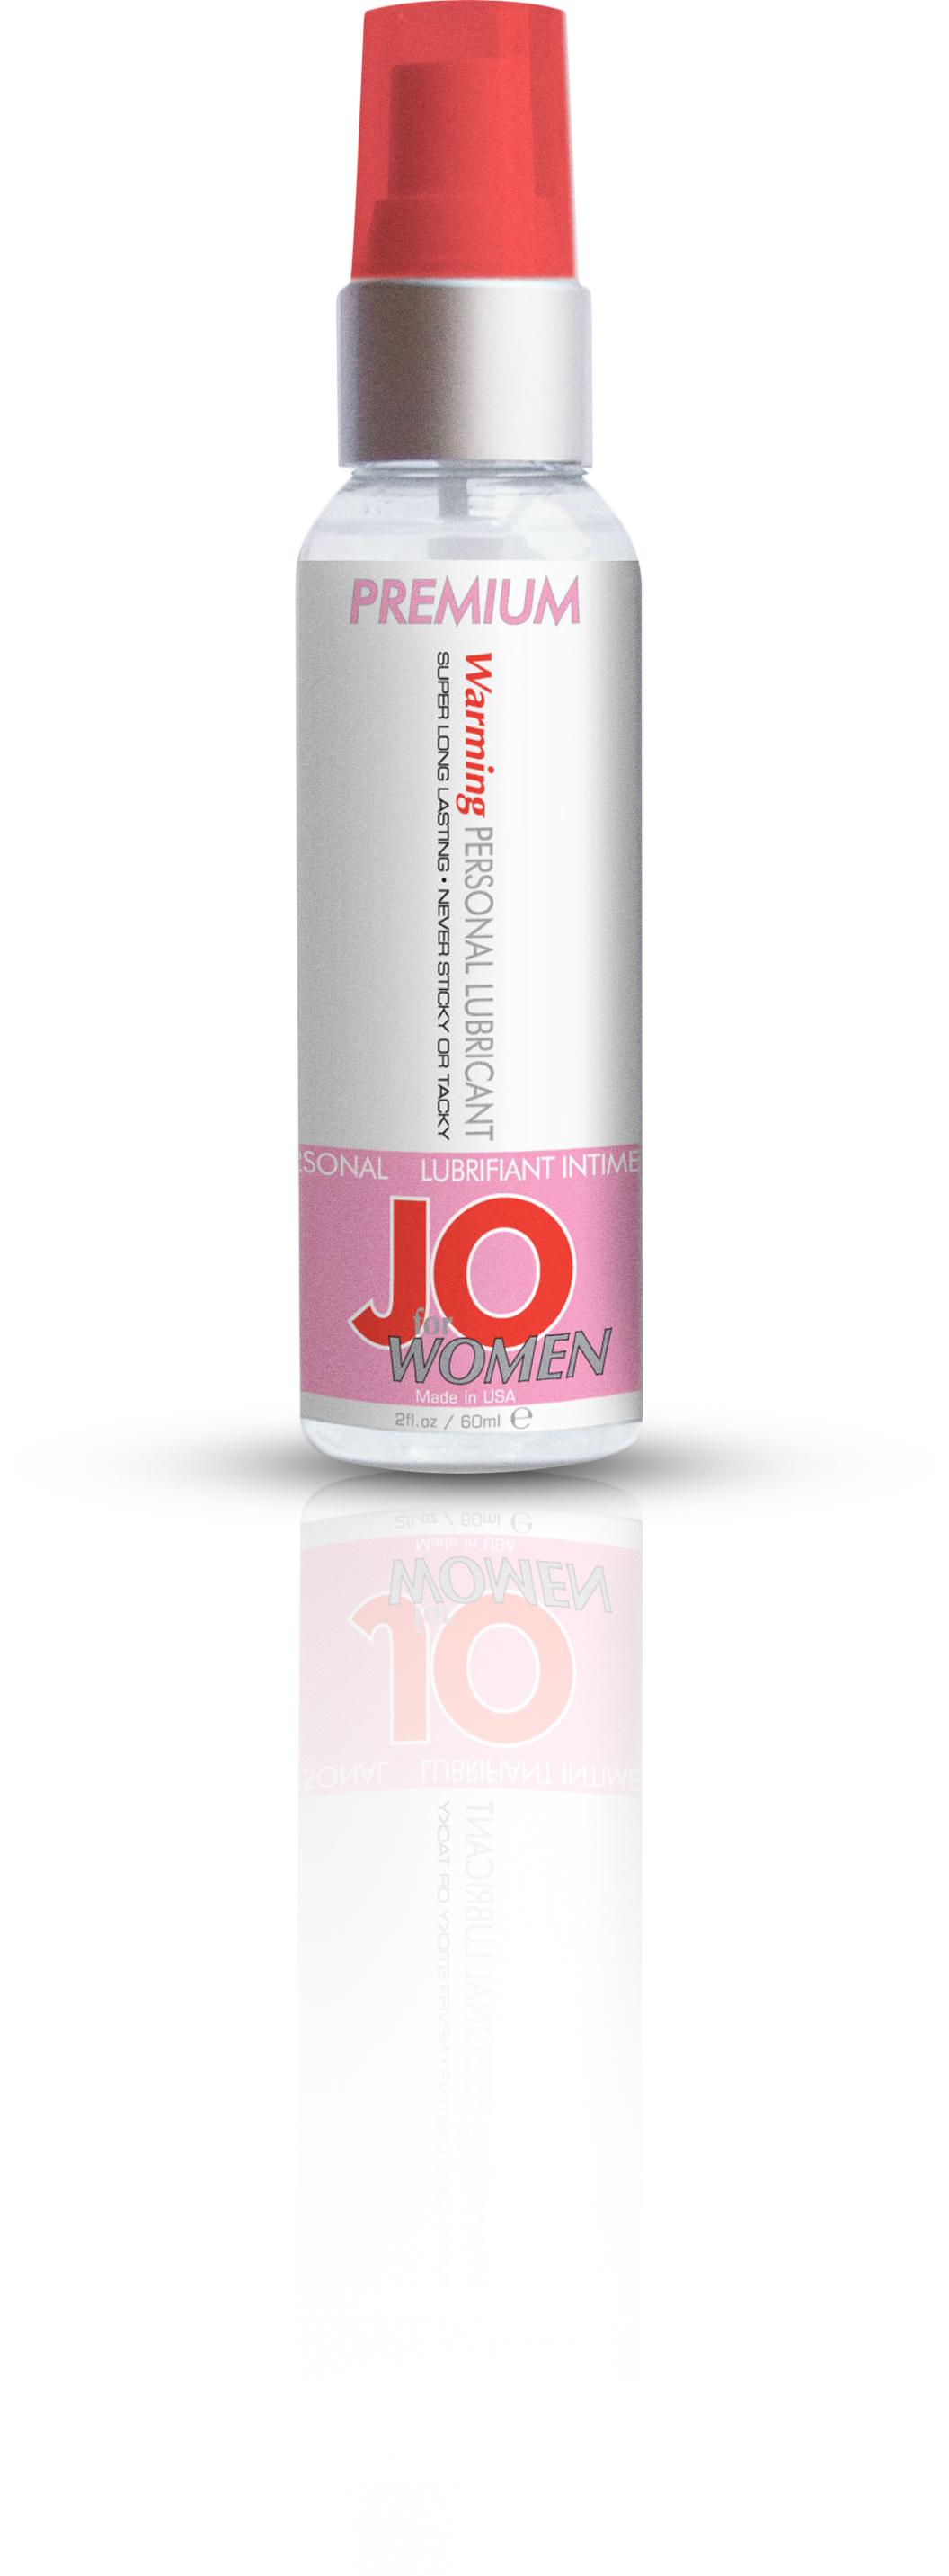 40058_JO_for_women_premium_lube_warm_2oz.jpg